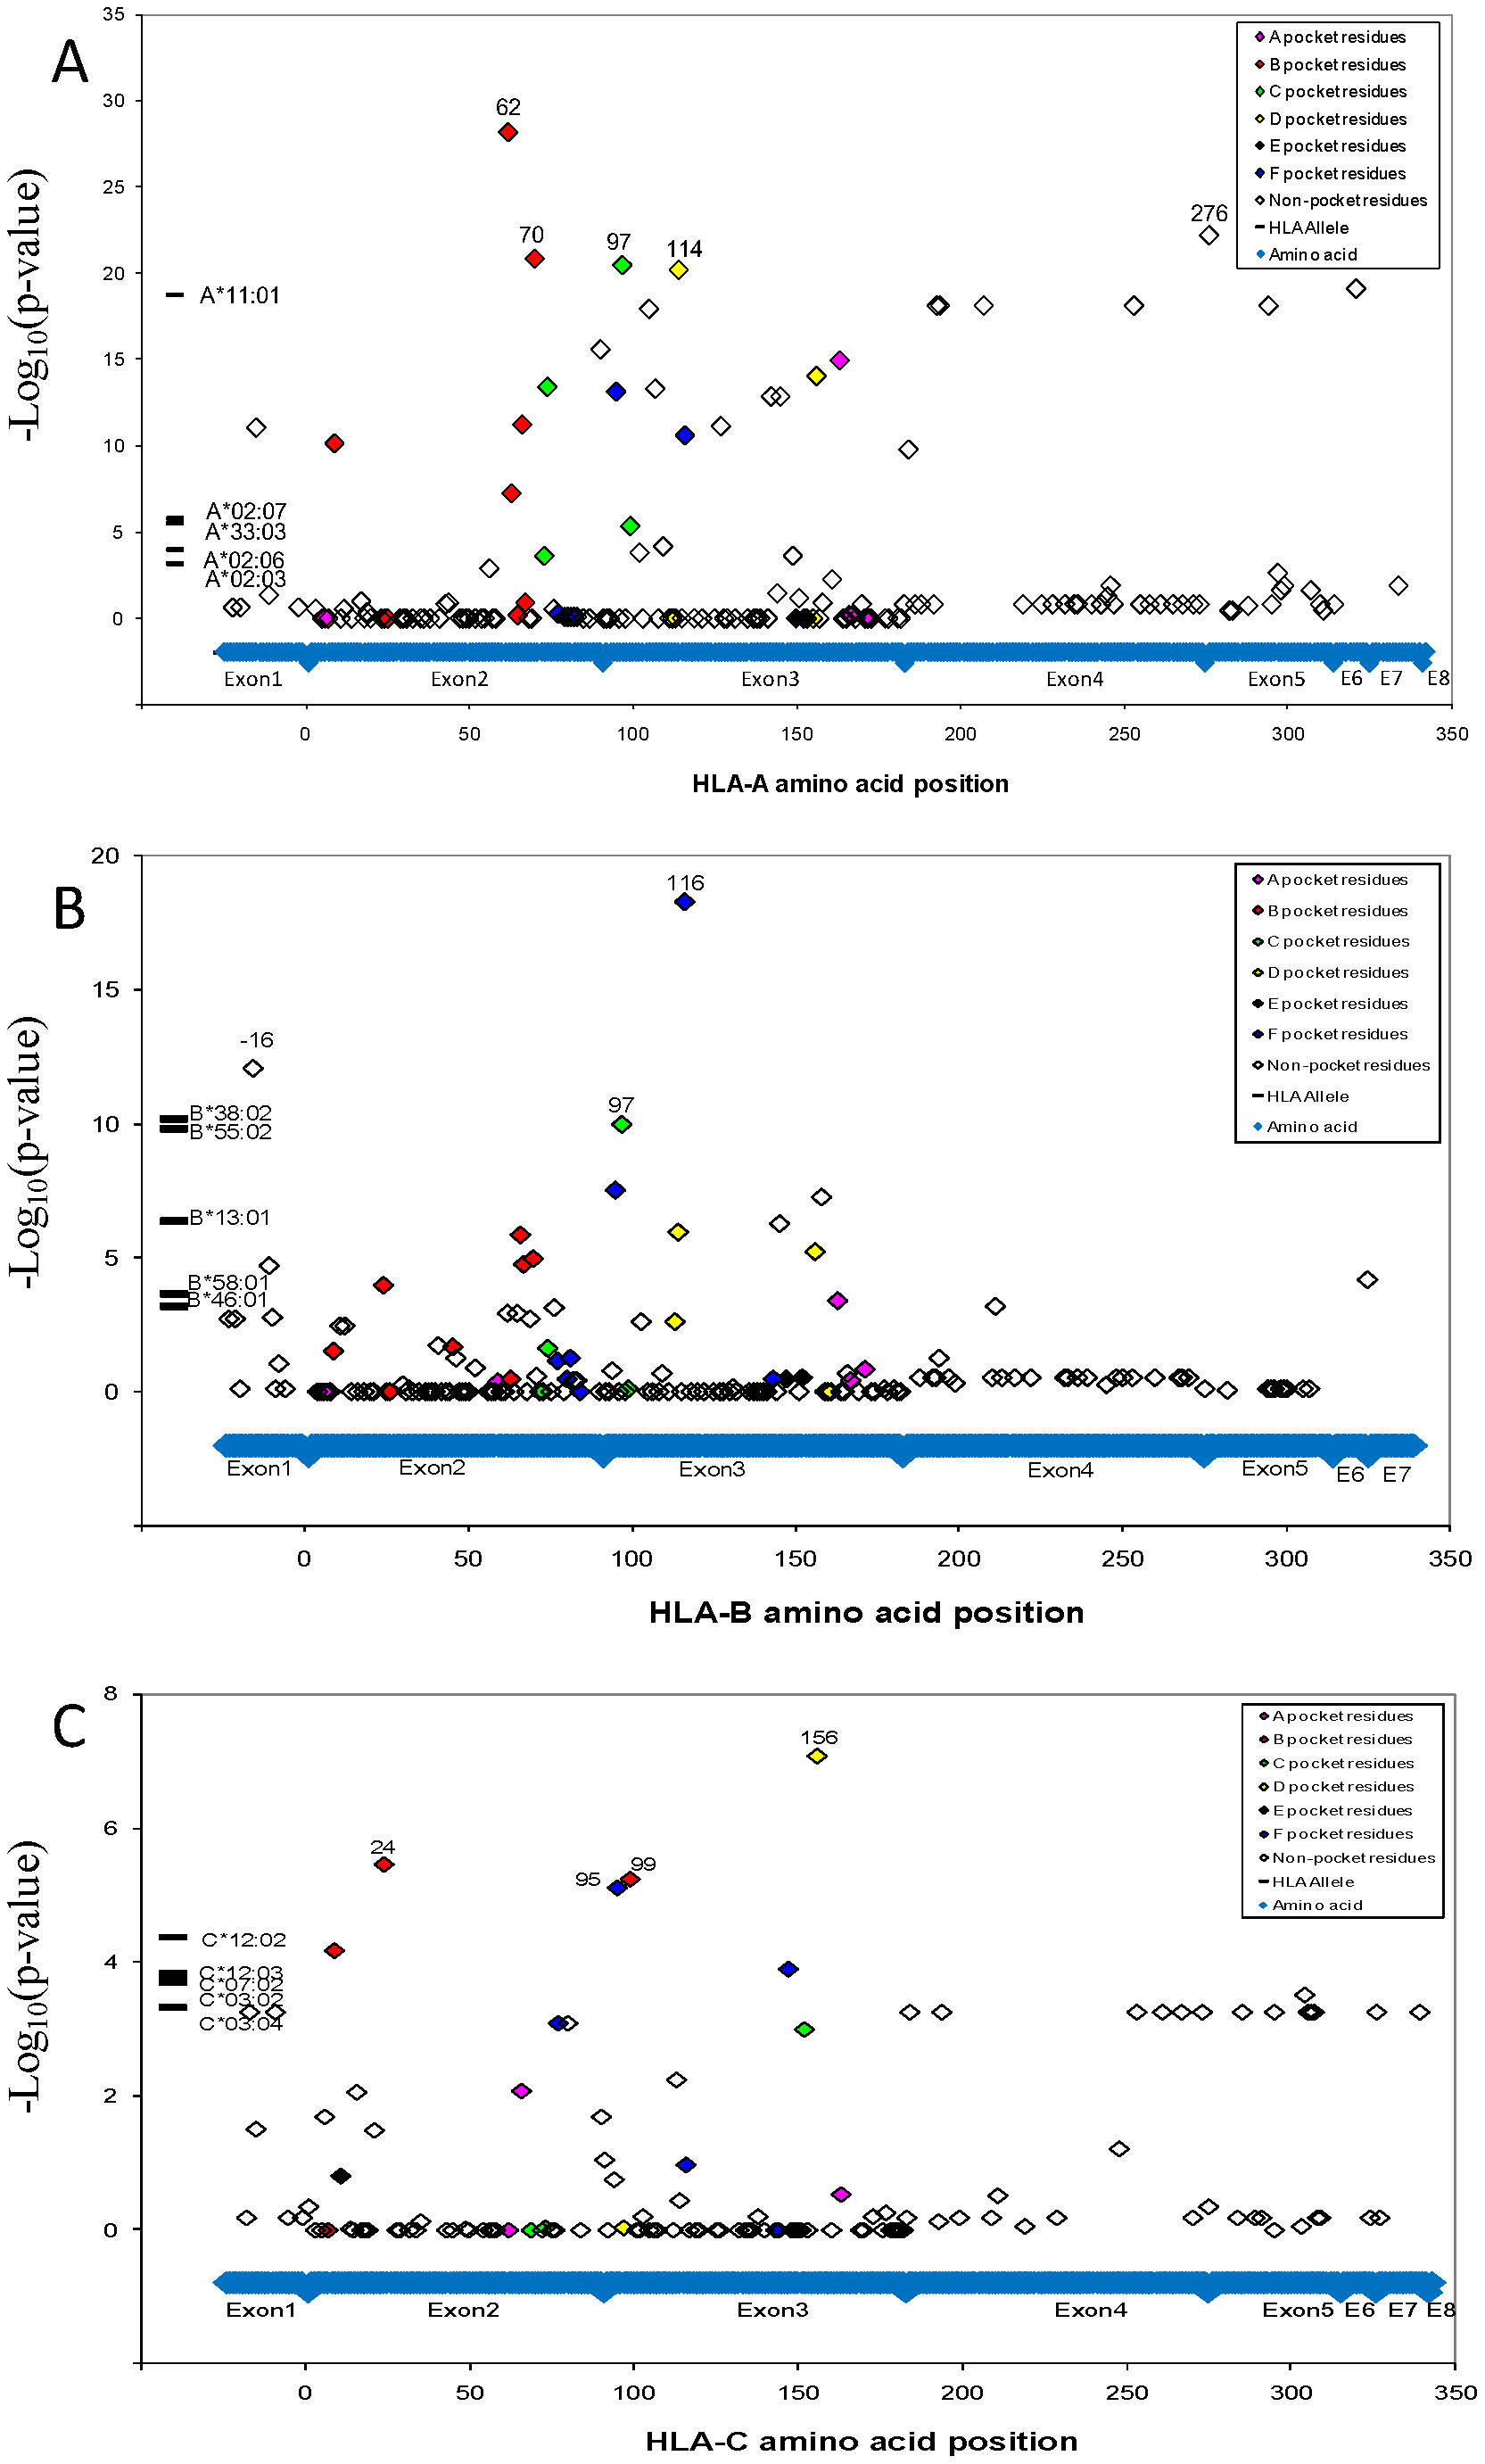 NPC associations of HLA alleles and amino acid variants.